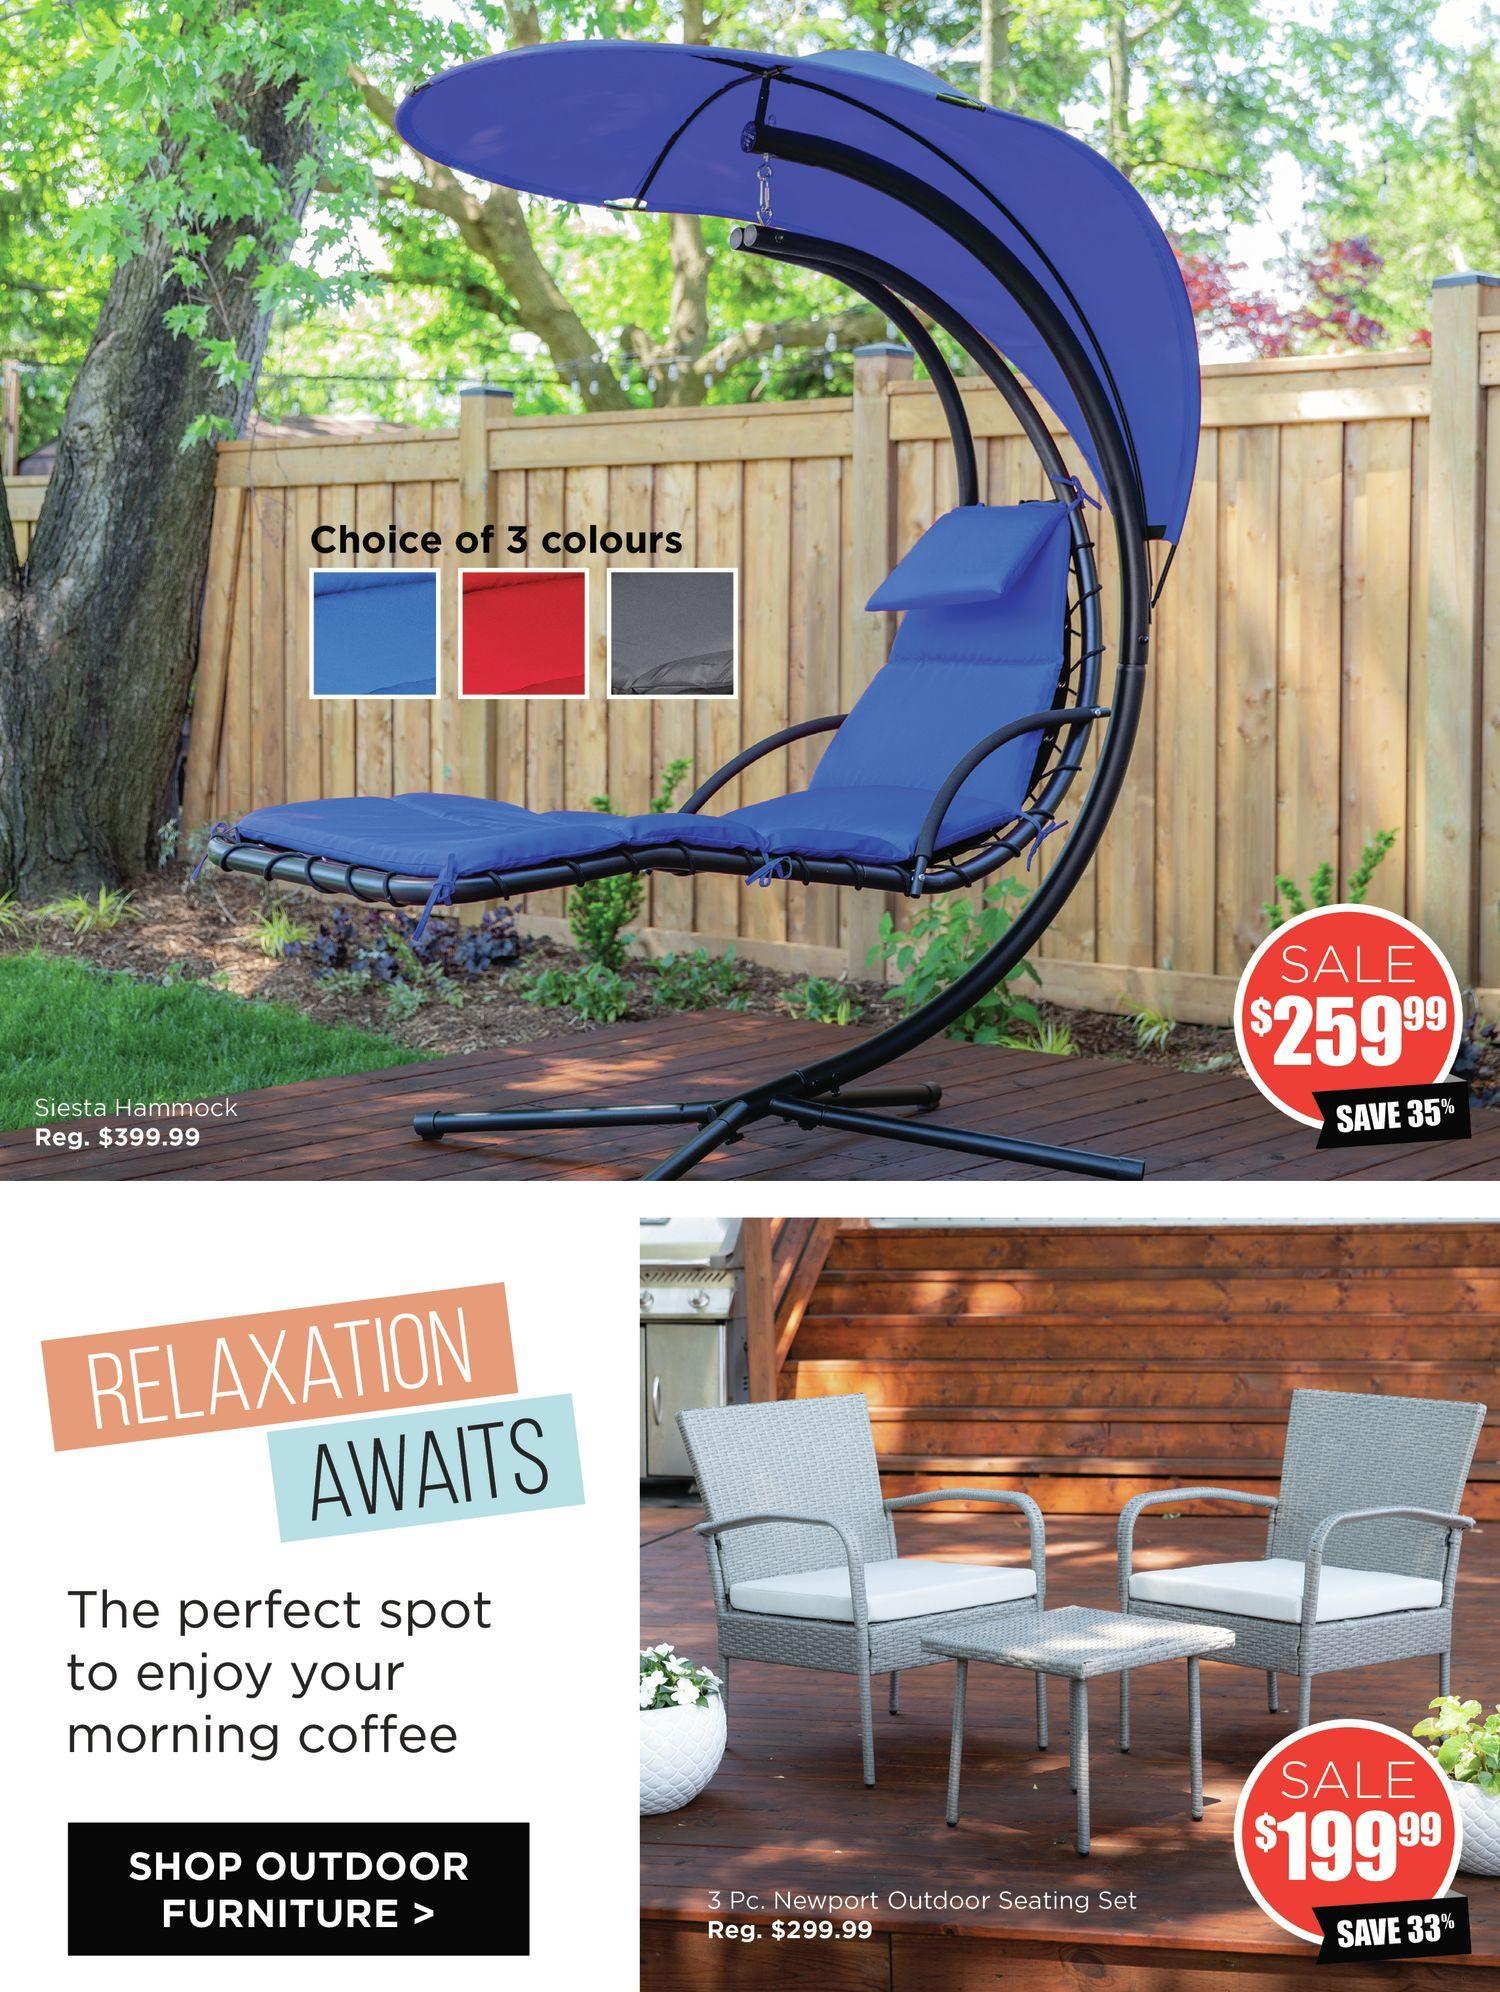 Kitchen Stuff Plus - Outdoor Entertaining Event - Page 10